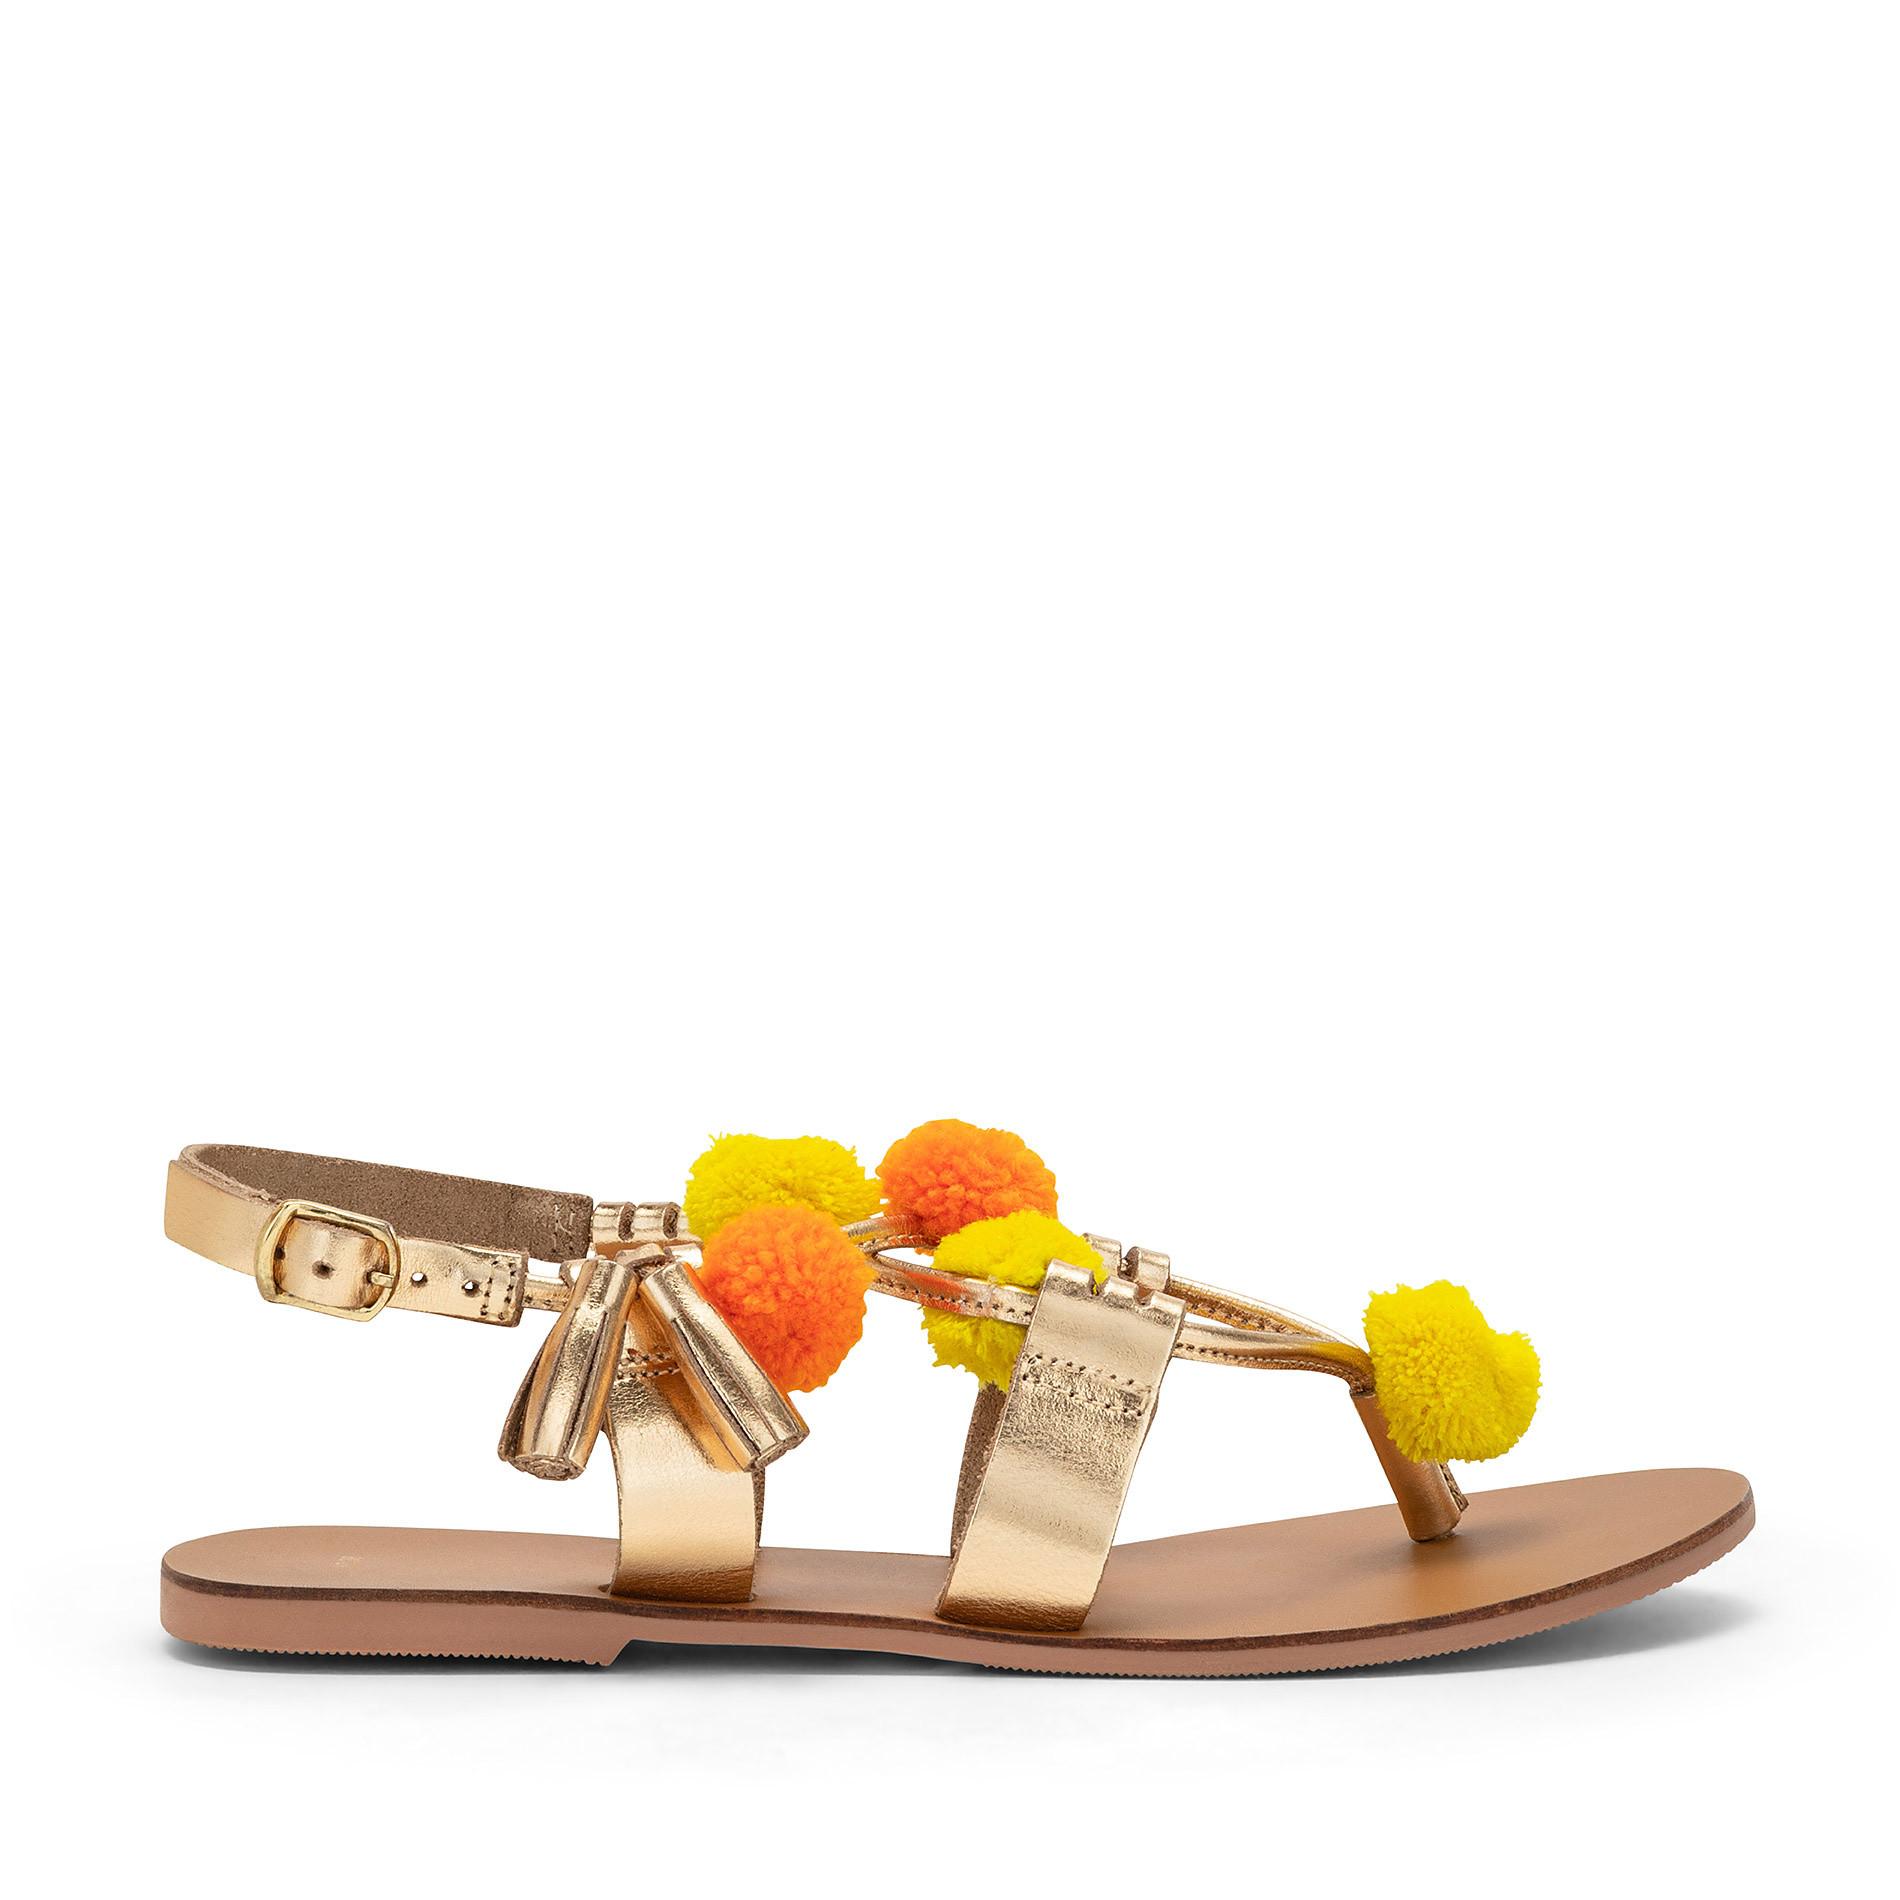 Sandalo infradito con pompon, Multicolor, large image number 1